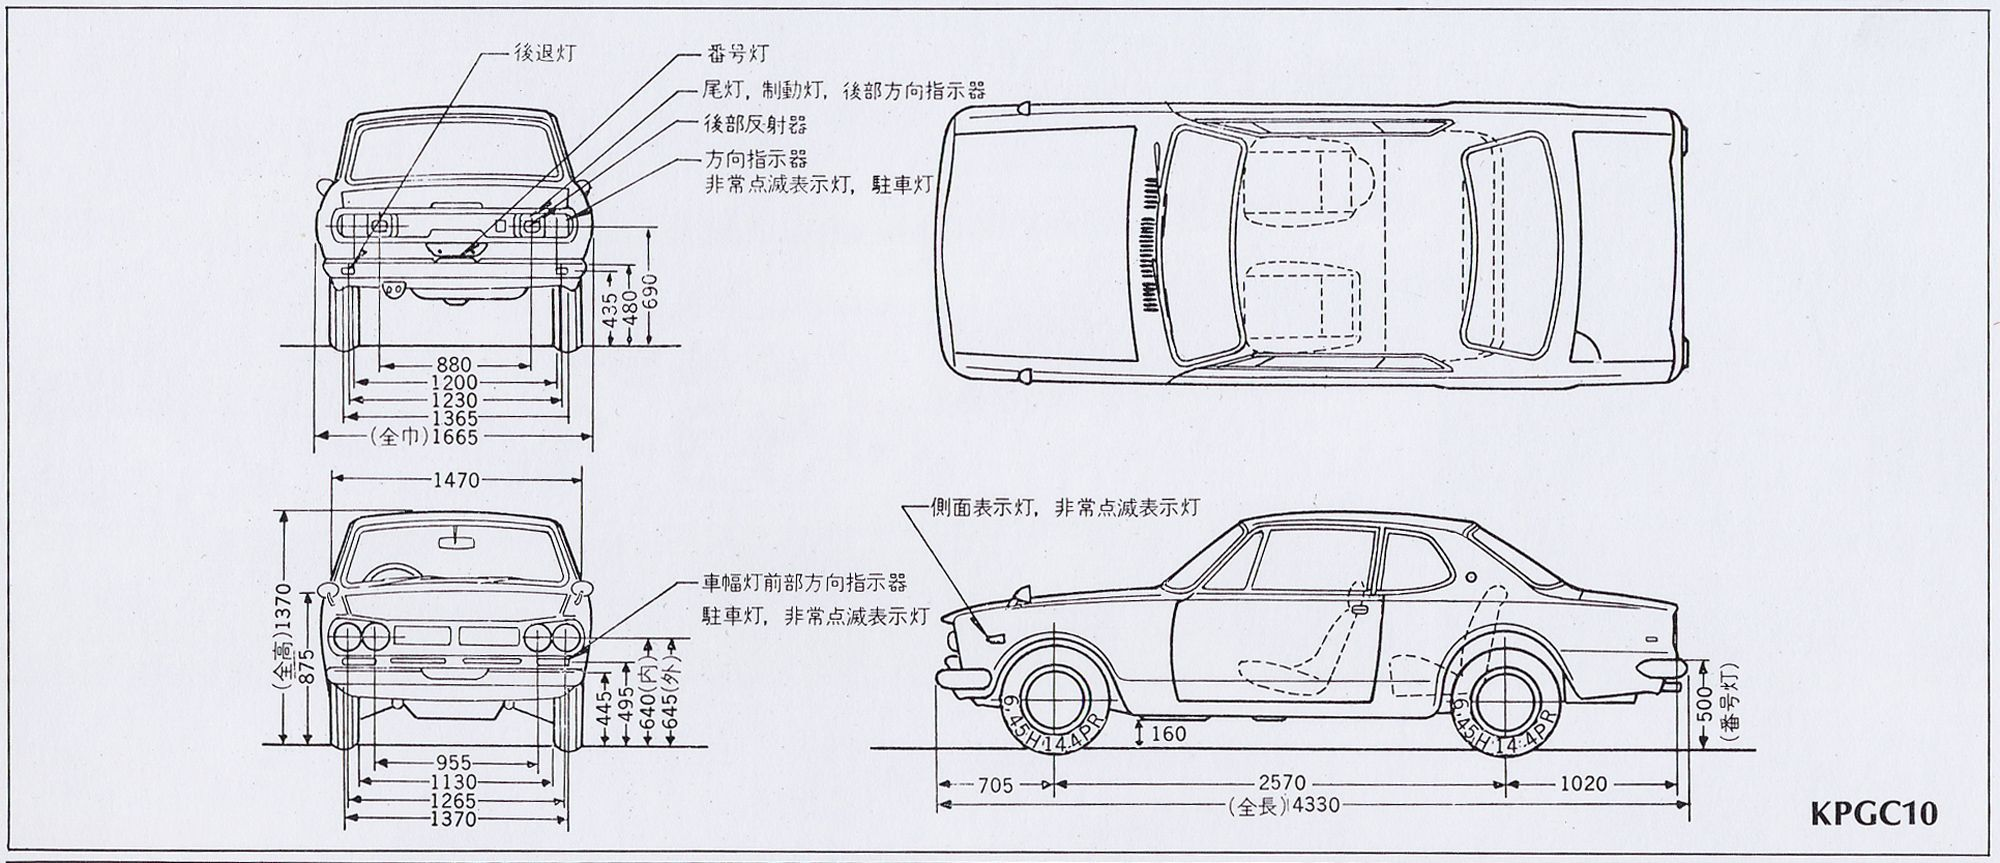 dimension kpgc hakosuka nissan skyline 2000 skyline gtr jdm cars automobile  [ 2000 x 863 Pixel ]